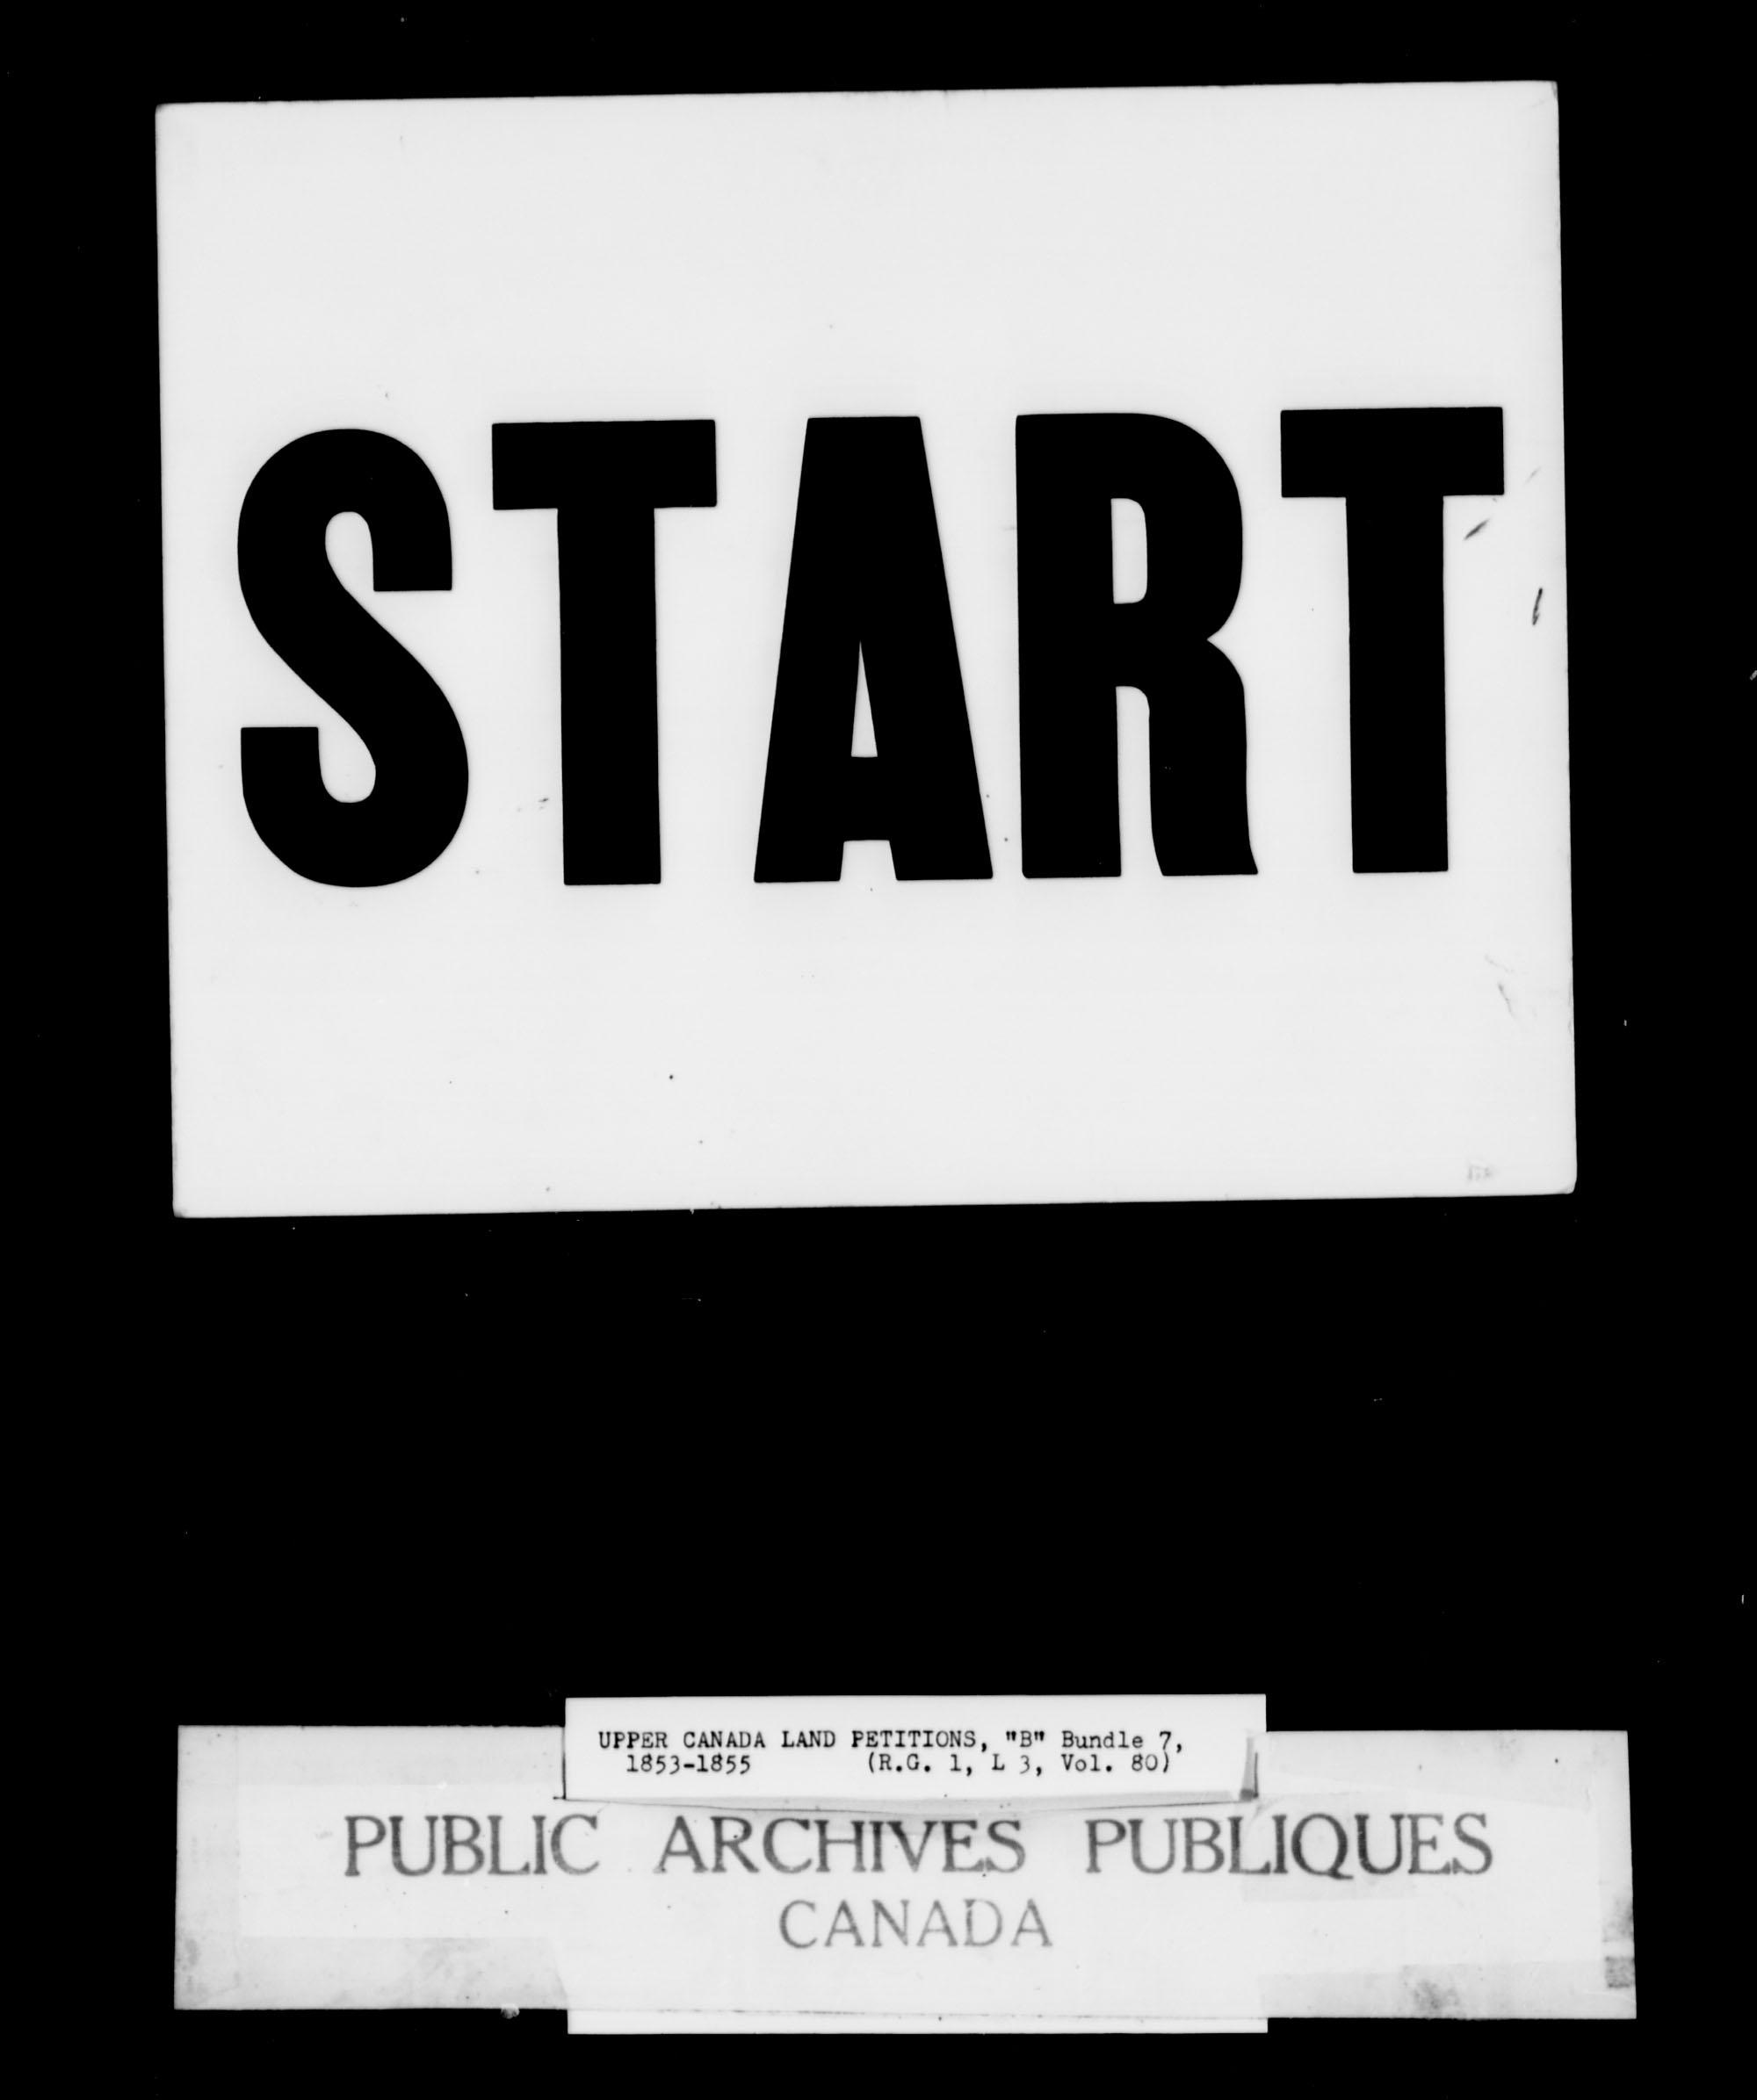 Titre: Demandes de terres du Haut-Canada (1763-1865) - N° d'enregistrement Mikan: 205131 - Microforme: c-1643